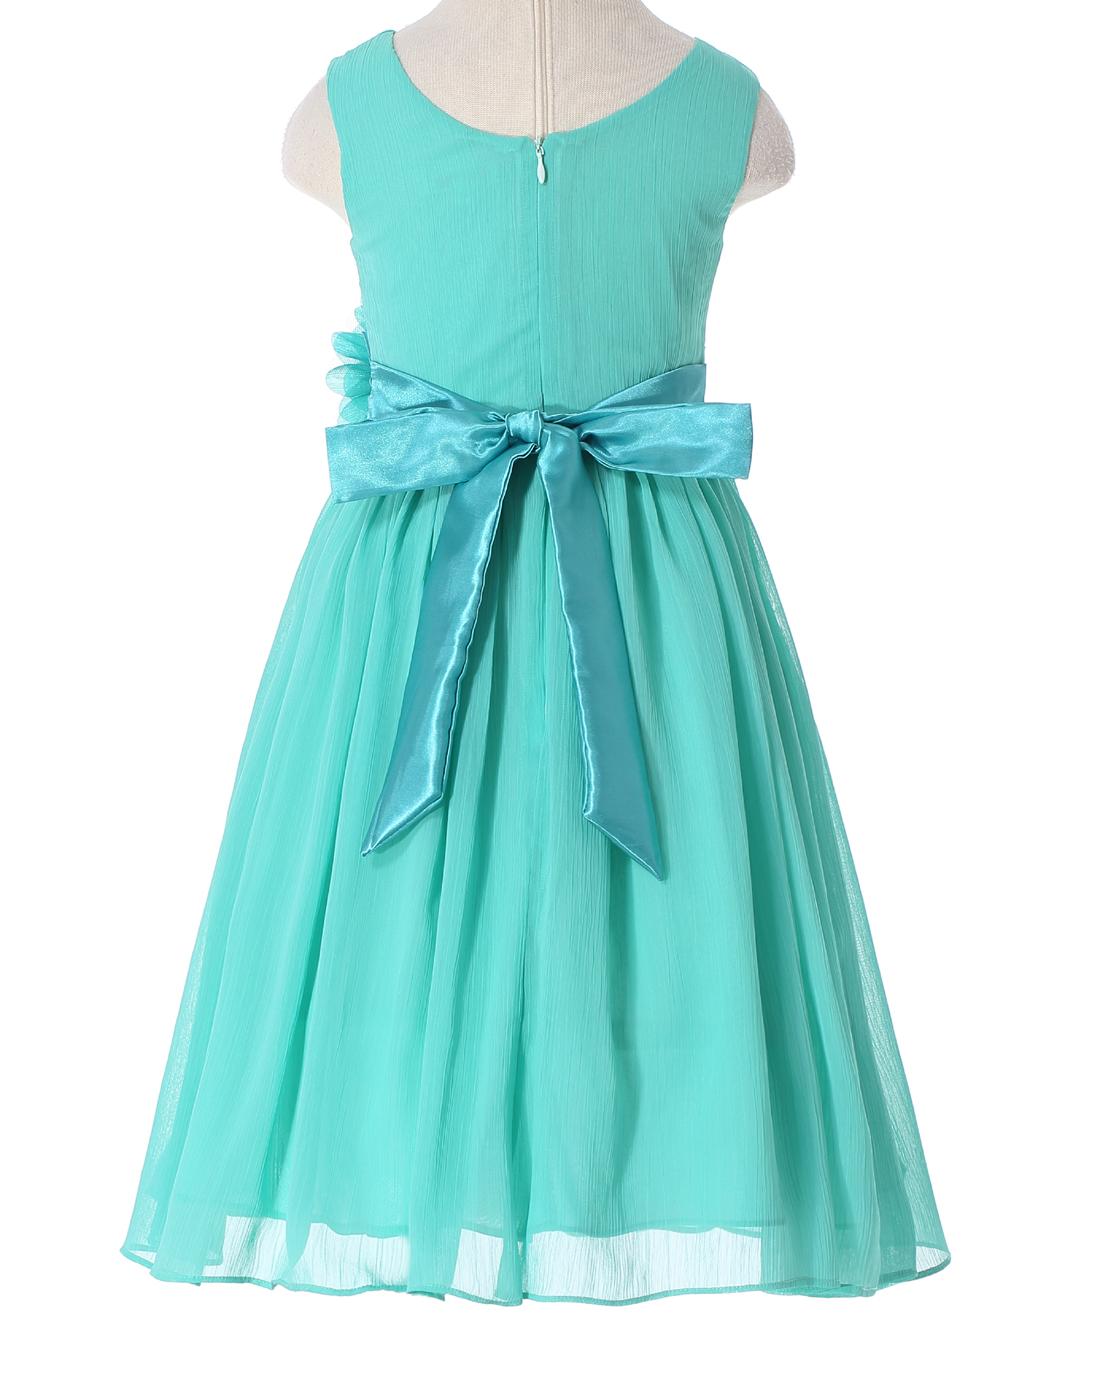 Bow Dream Turquoise 6 Pageant Flower Girl Dress sleeveless ...